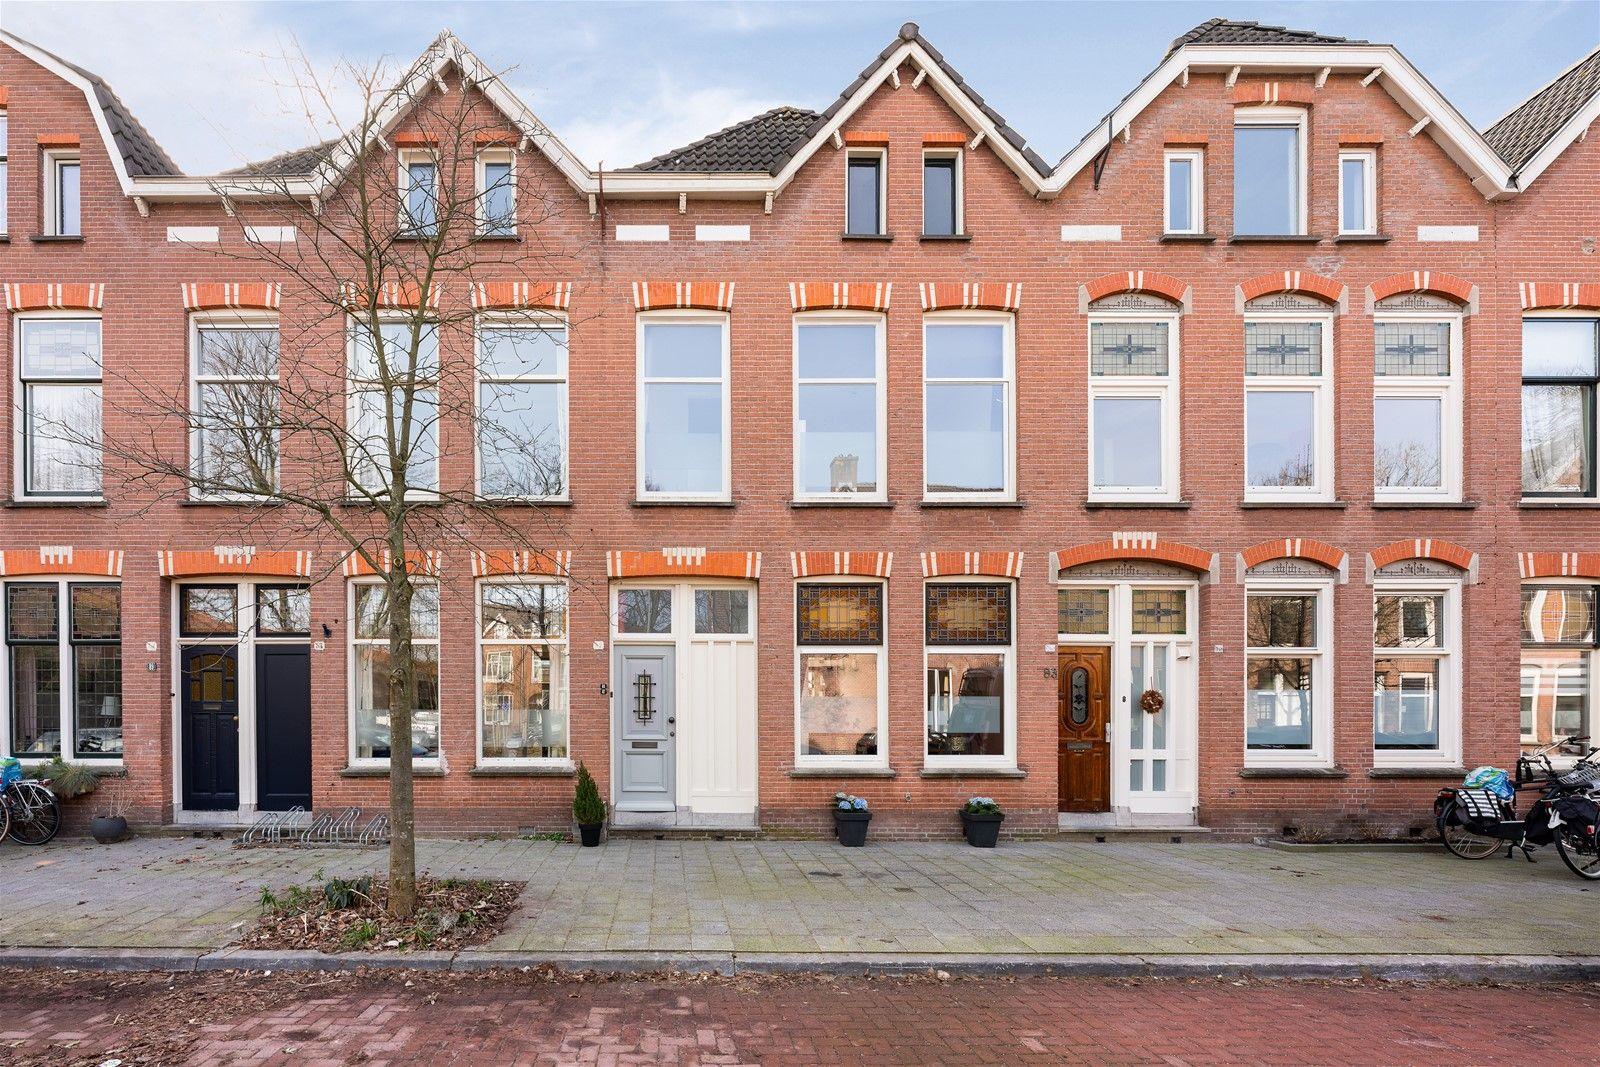 Sumatrastraat 85-87, Dordrecht